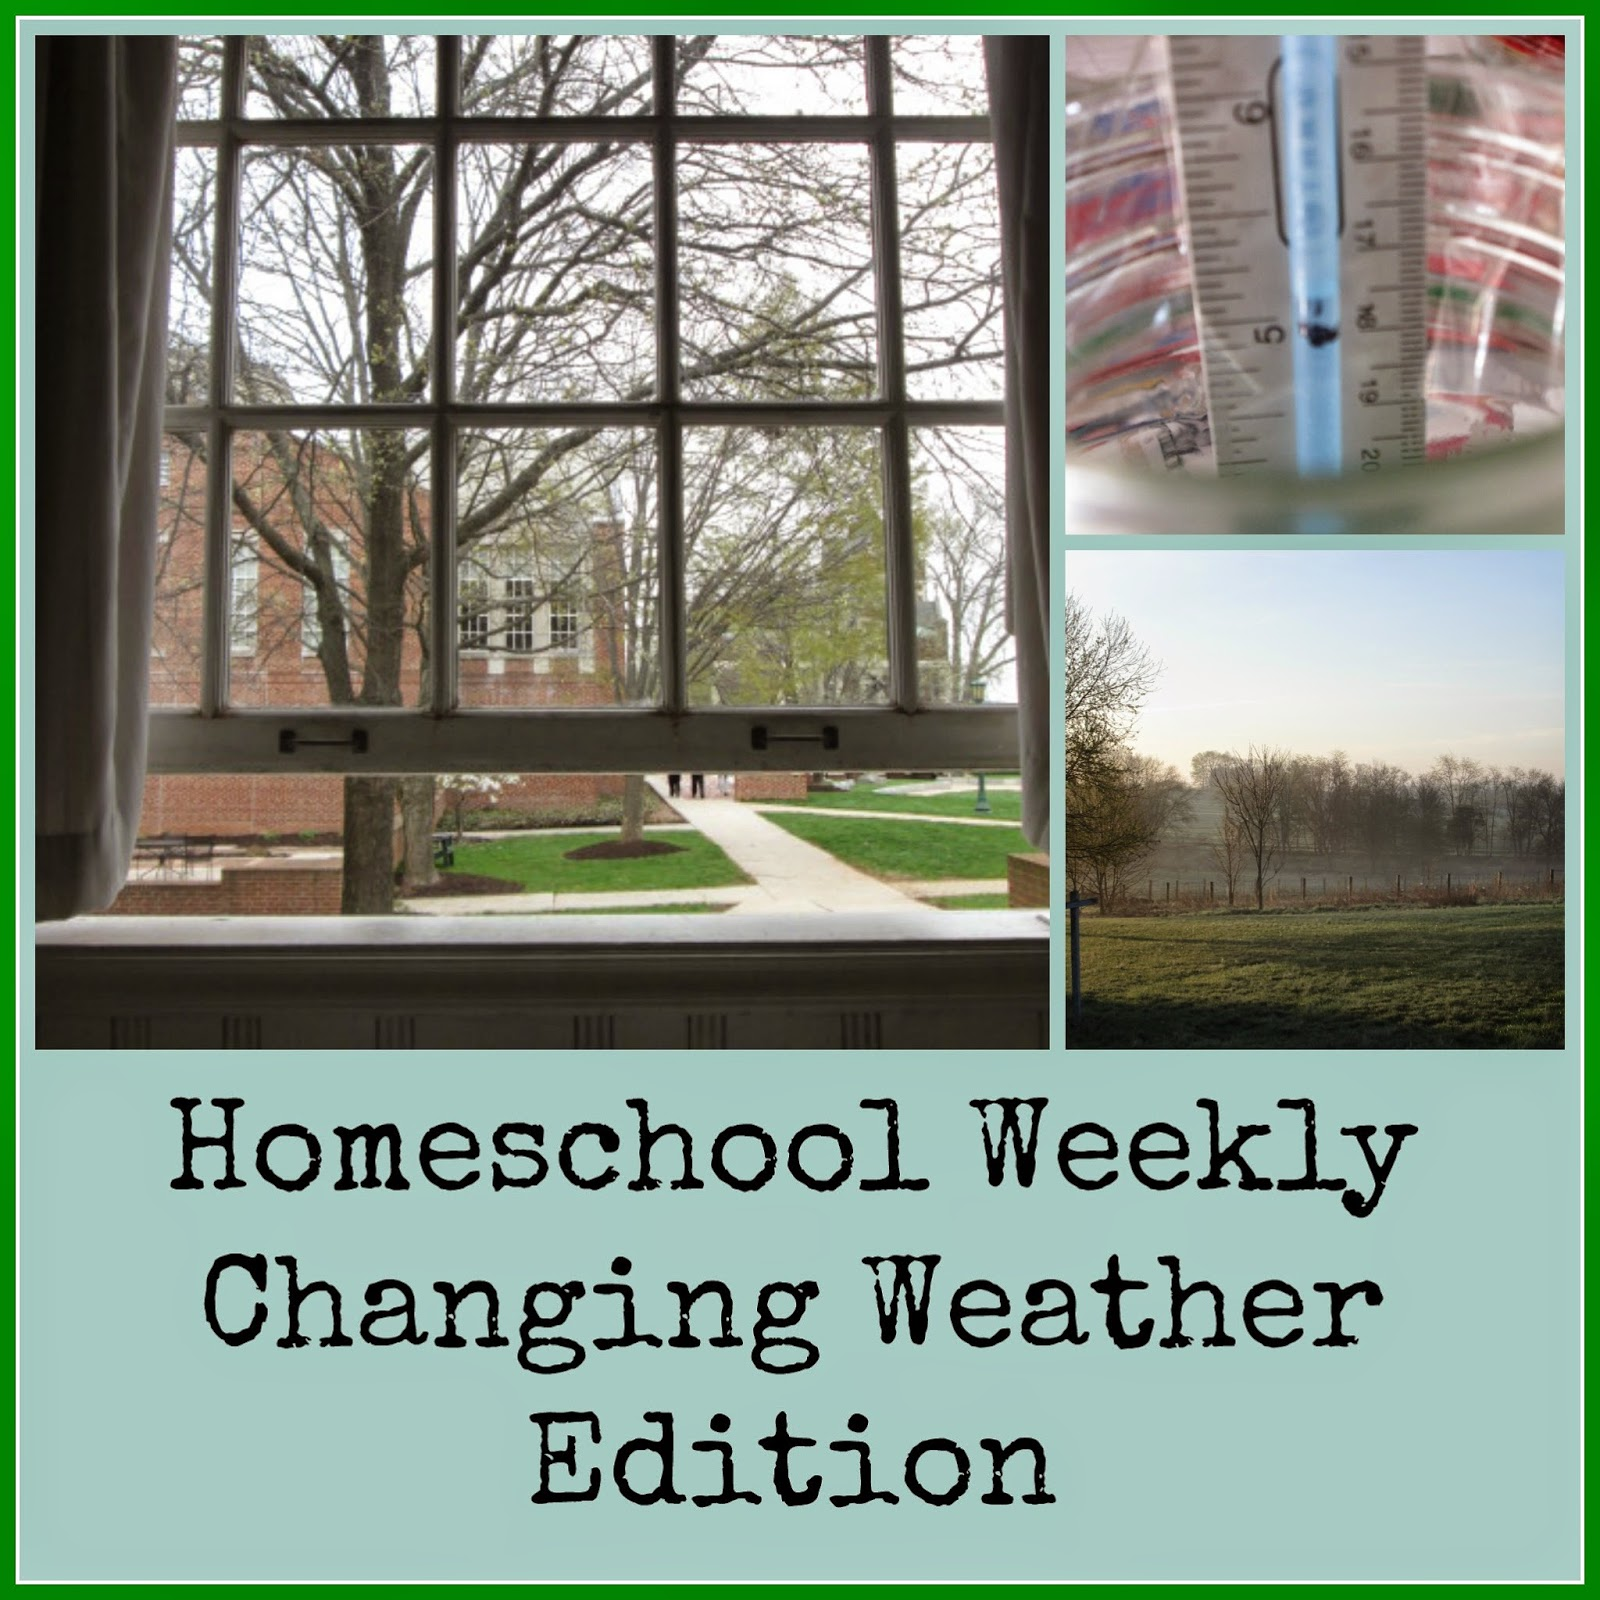 Homeschool Weekly: Changing Weather Edition at Homeschool Coffee Break - kympossibleblog.blogspot.com